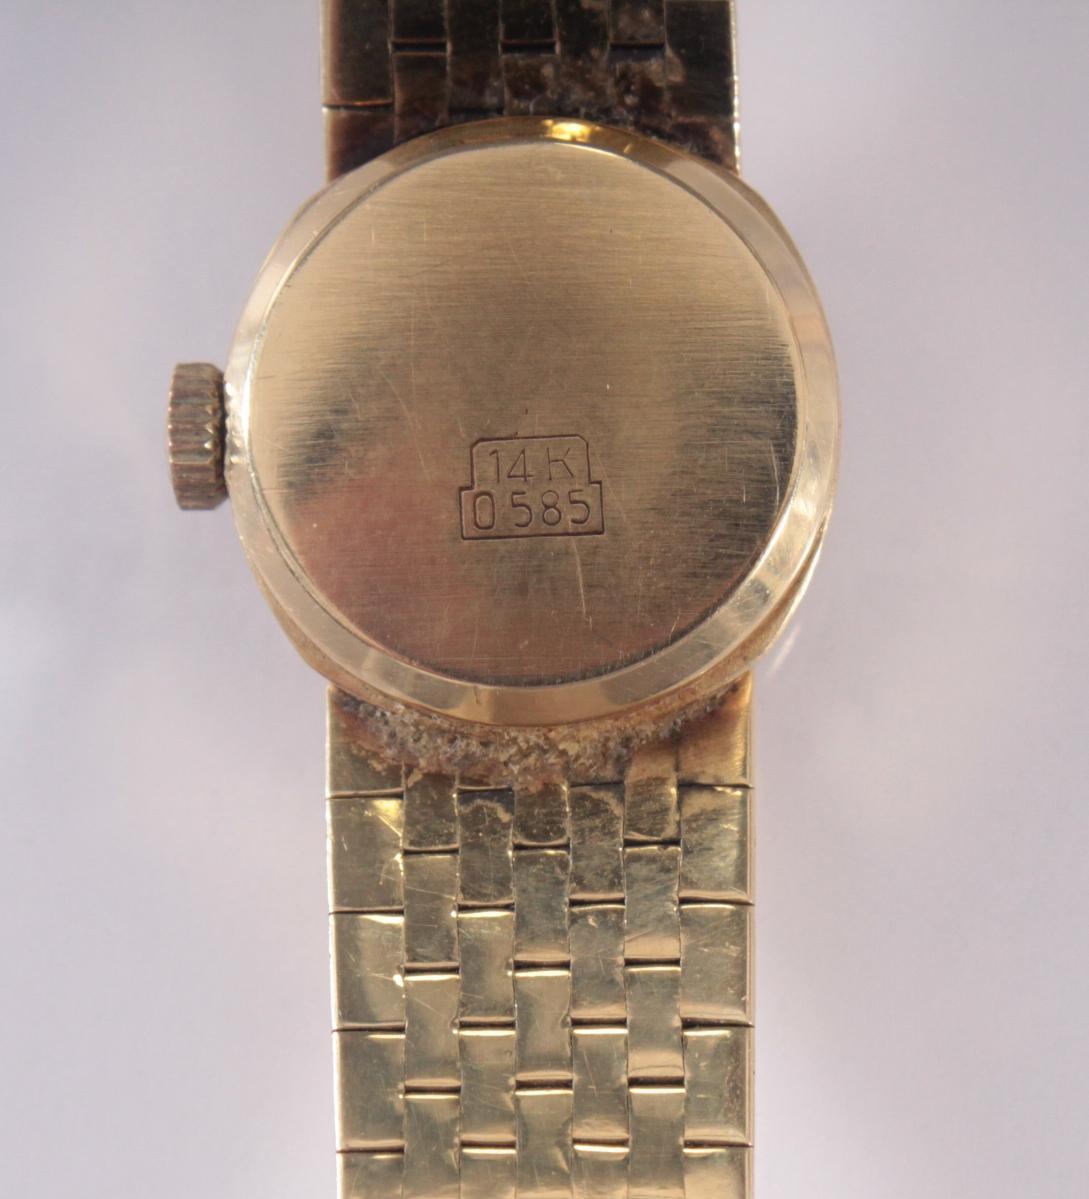 Damenarmbanduhr der Marke Drafa aus 14 Karat Gelbgold-4